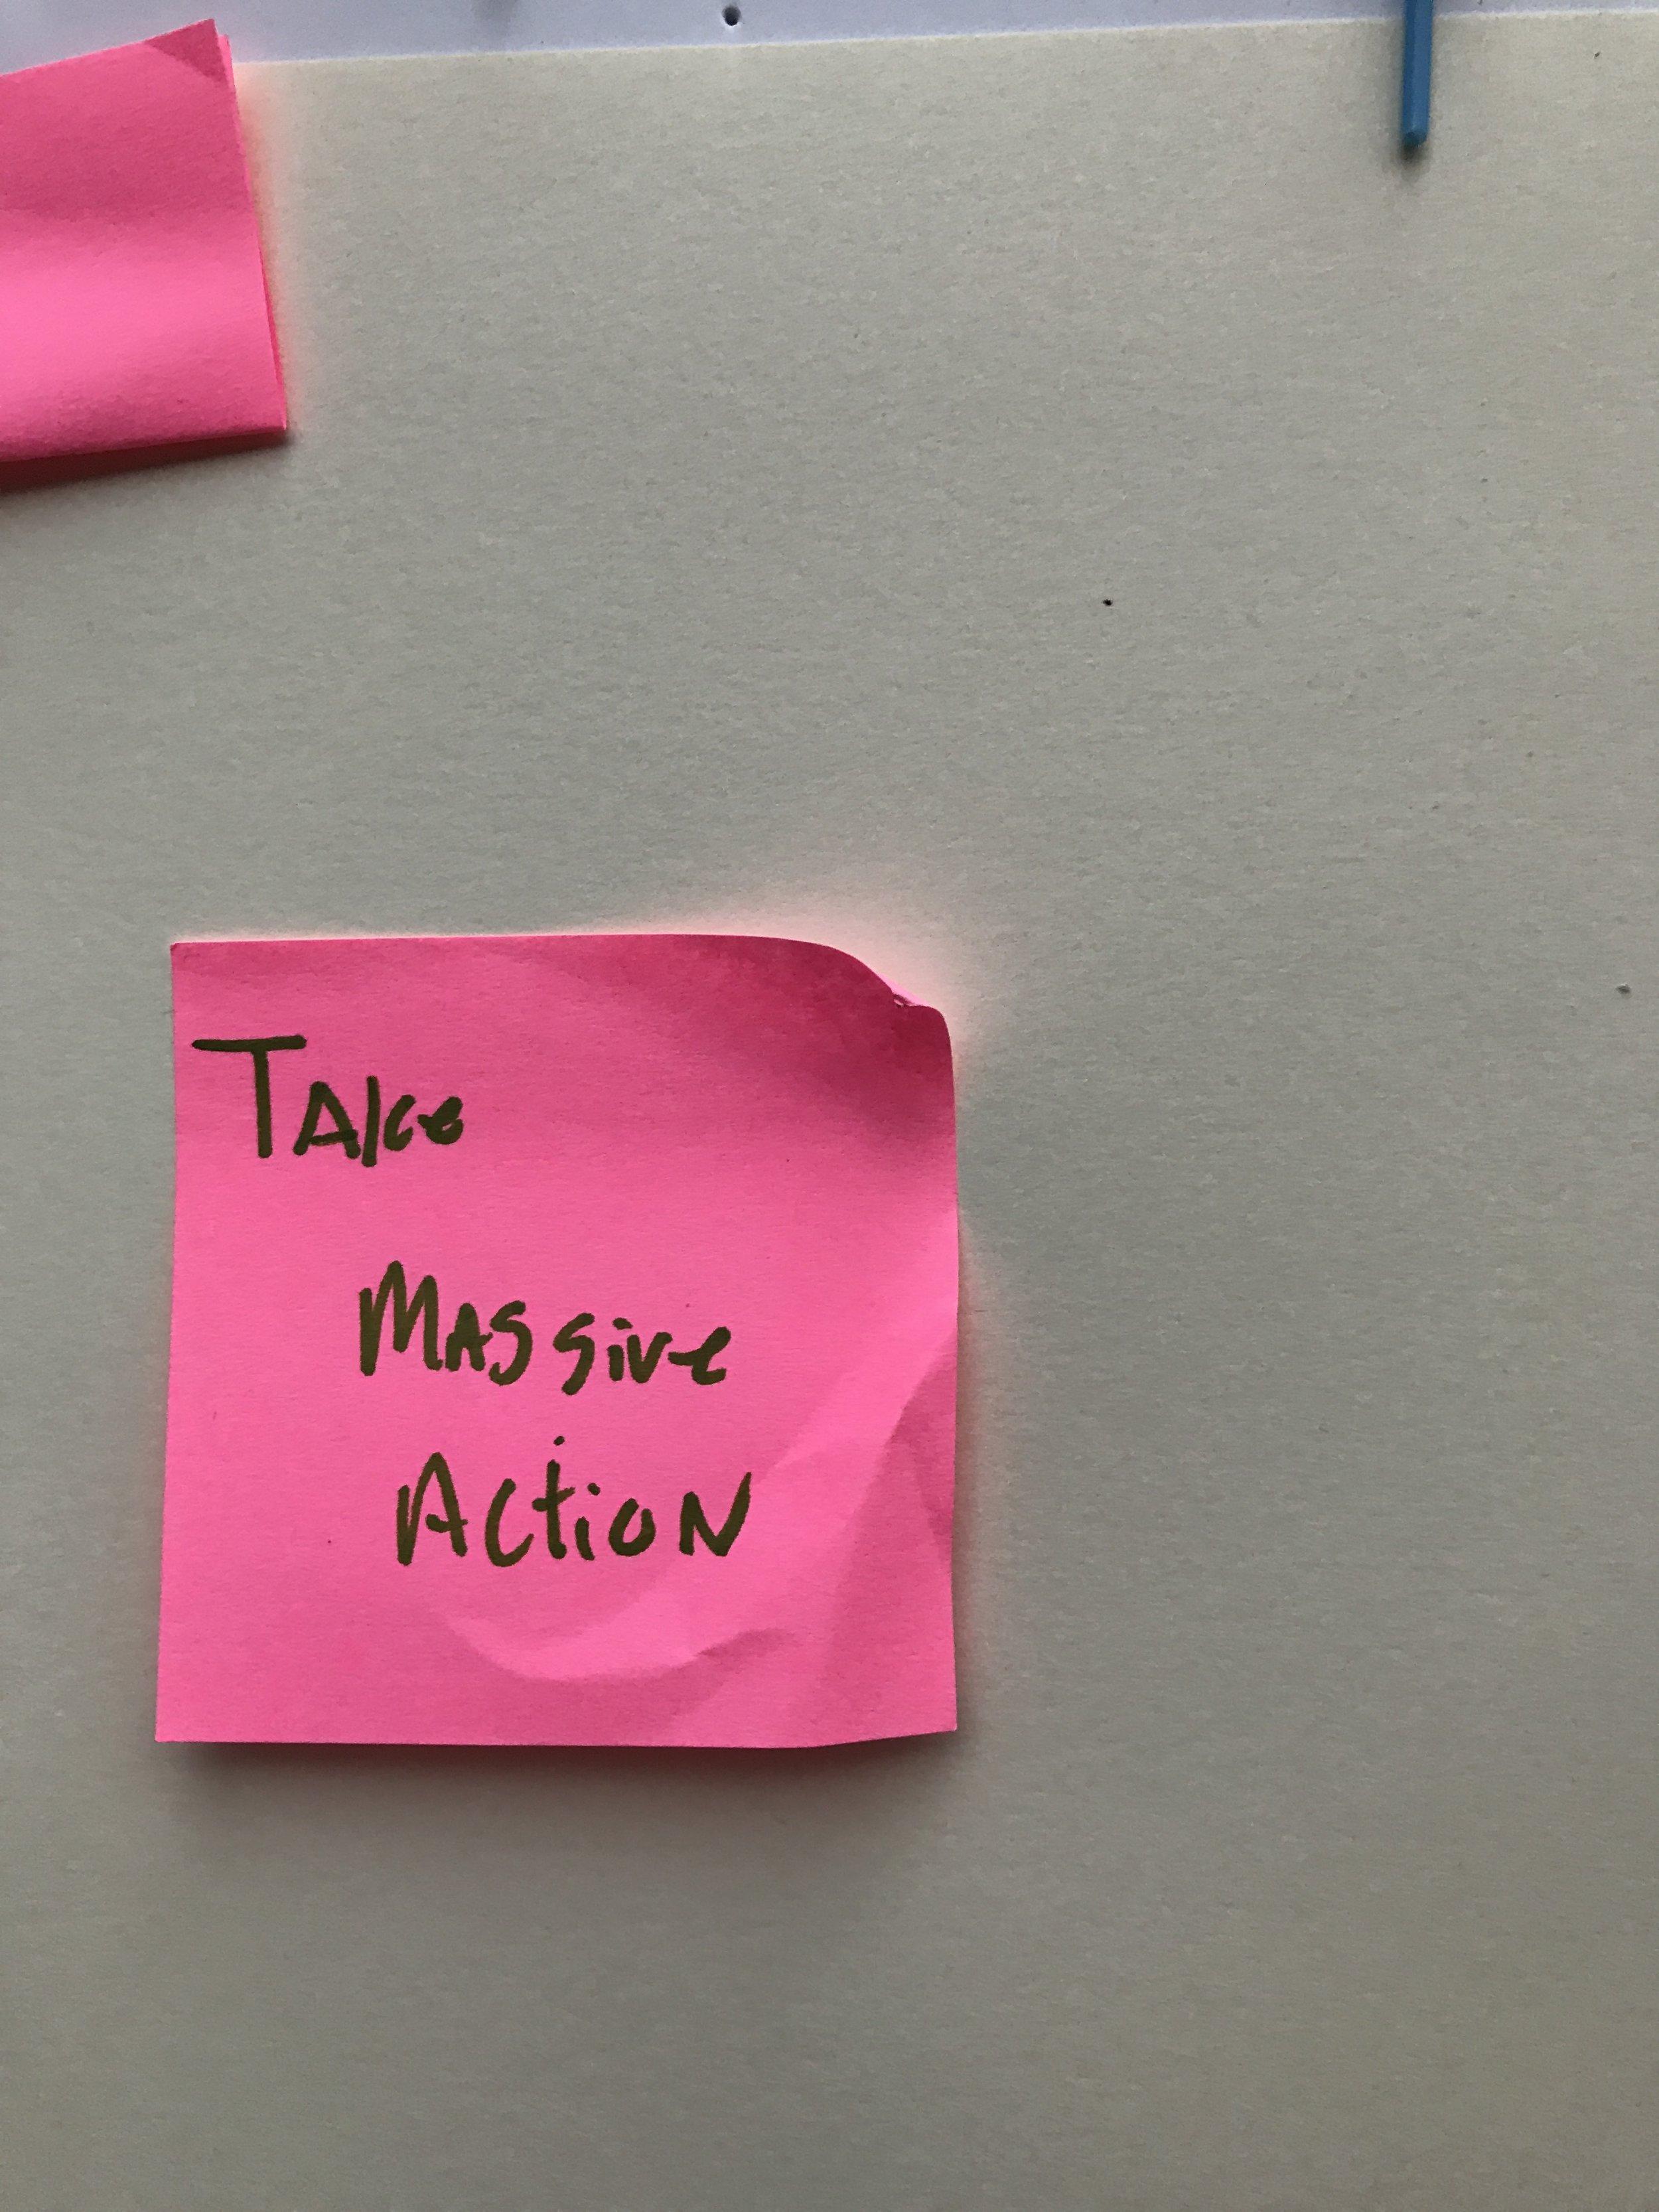 Massive Action.JPG